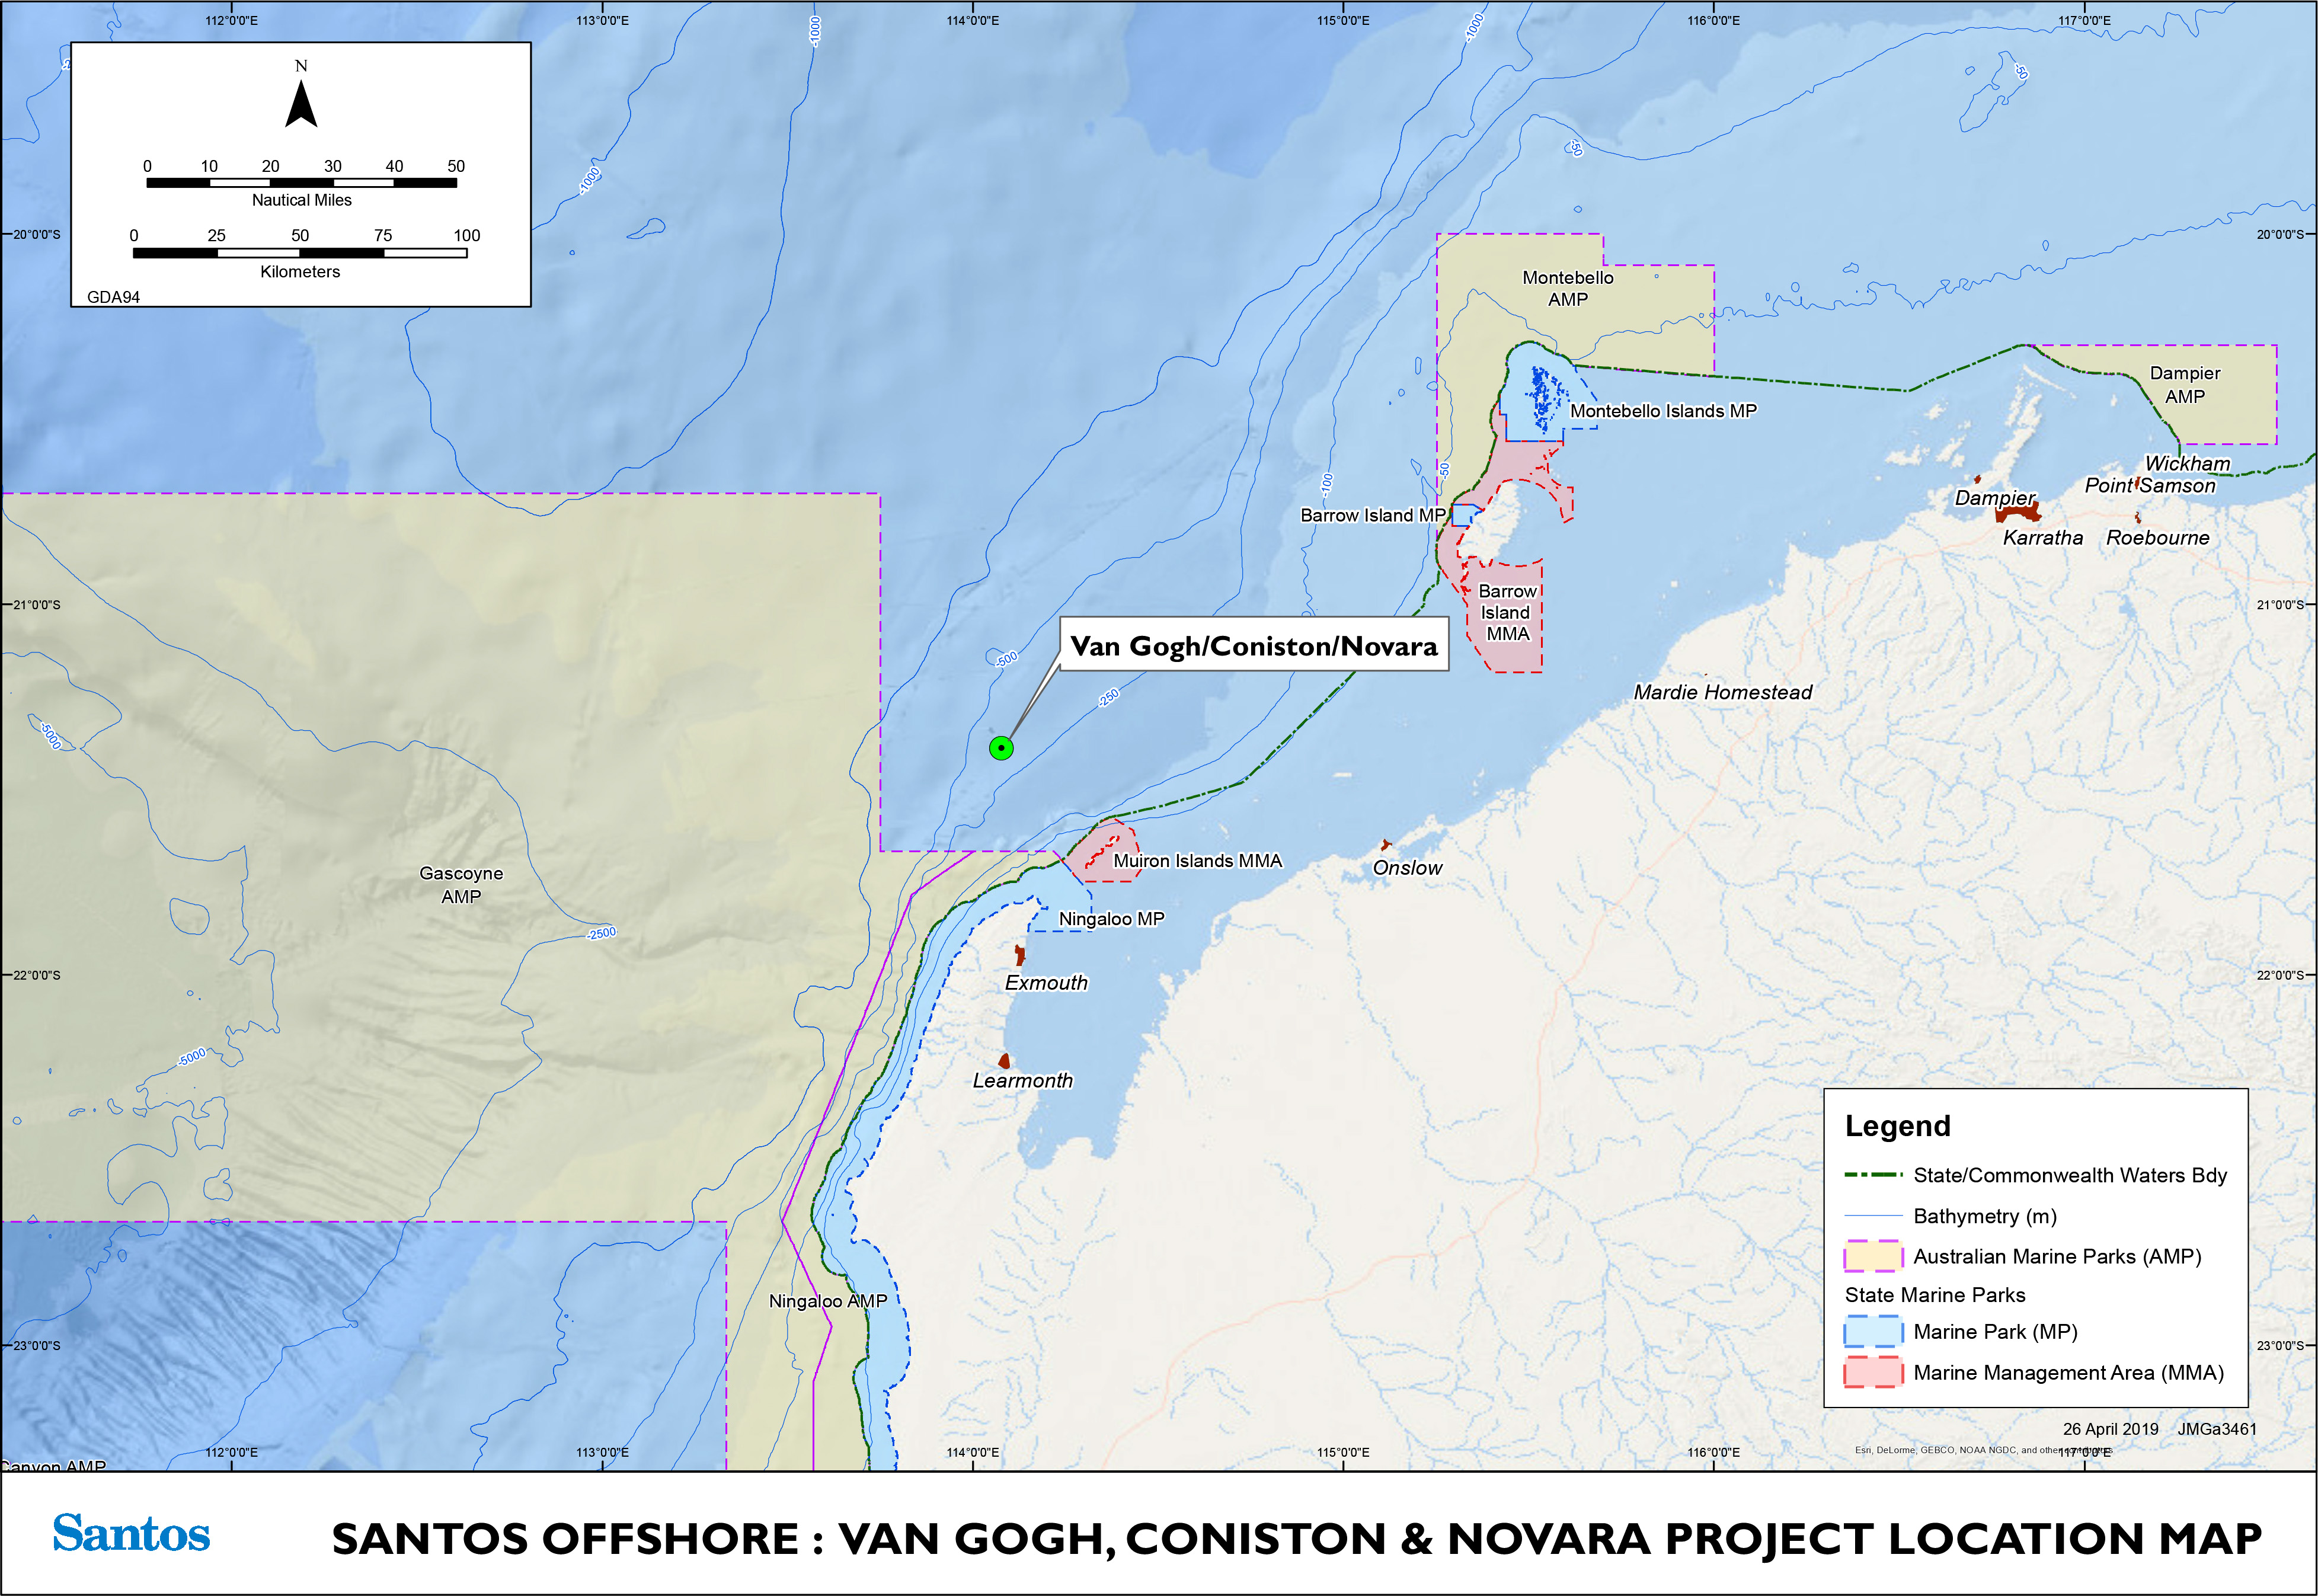 Project map - Van Gogh Coniston Novara Field Developments (refer to Description)